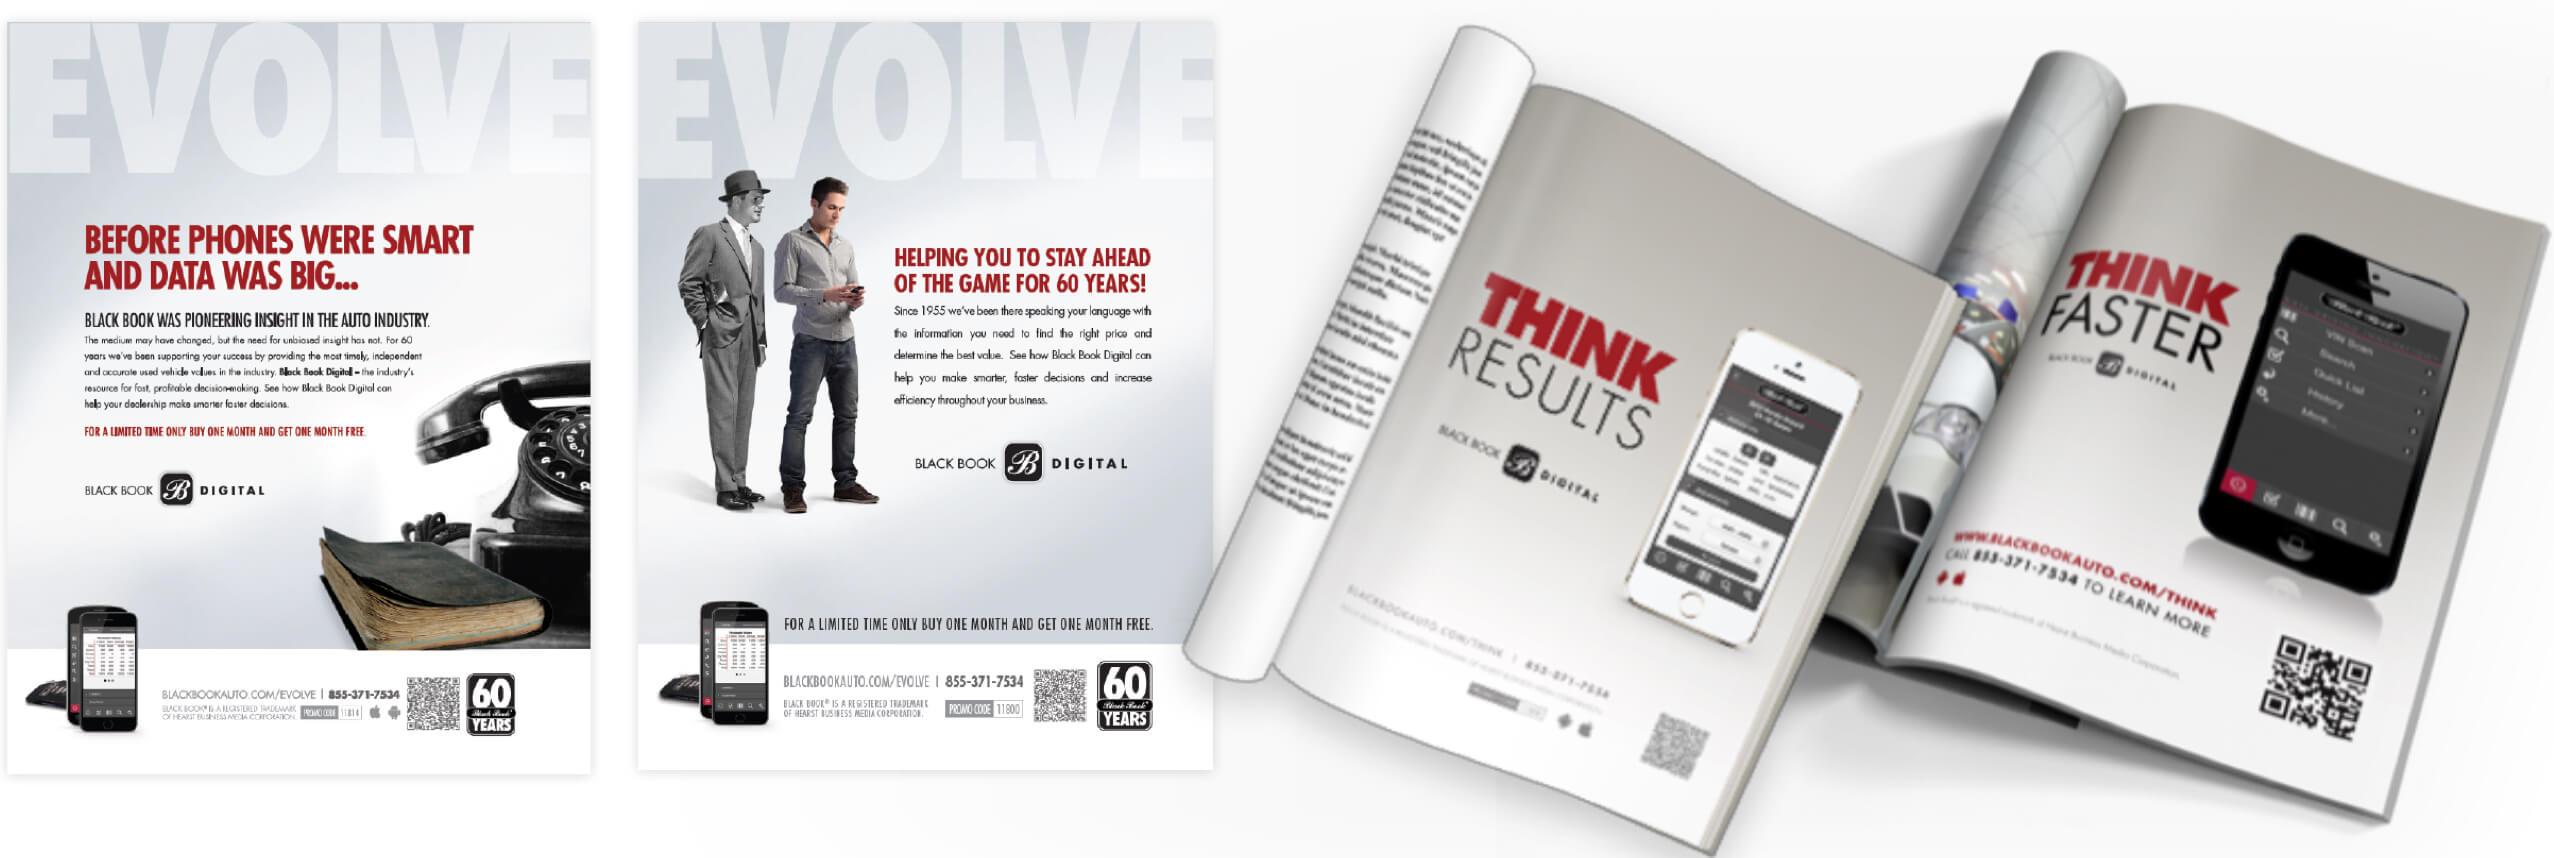 Automotive PR Marketing Evolve